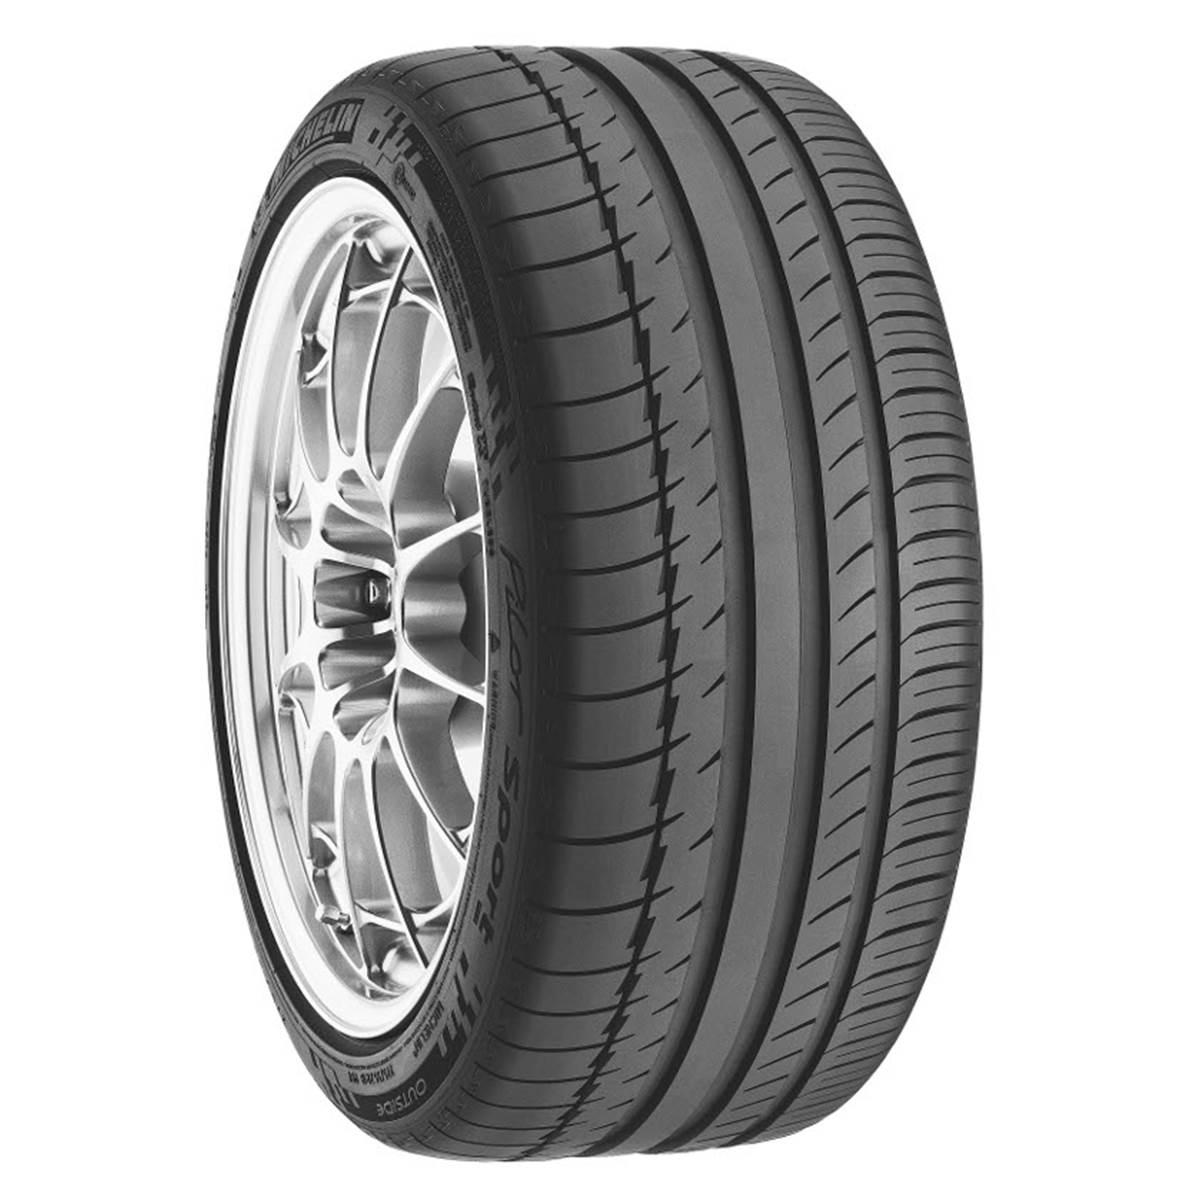 Pneu Michelin 275/45R20 110Y Pilot Sport Ps2 XL